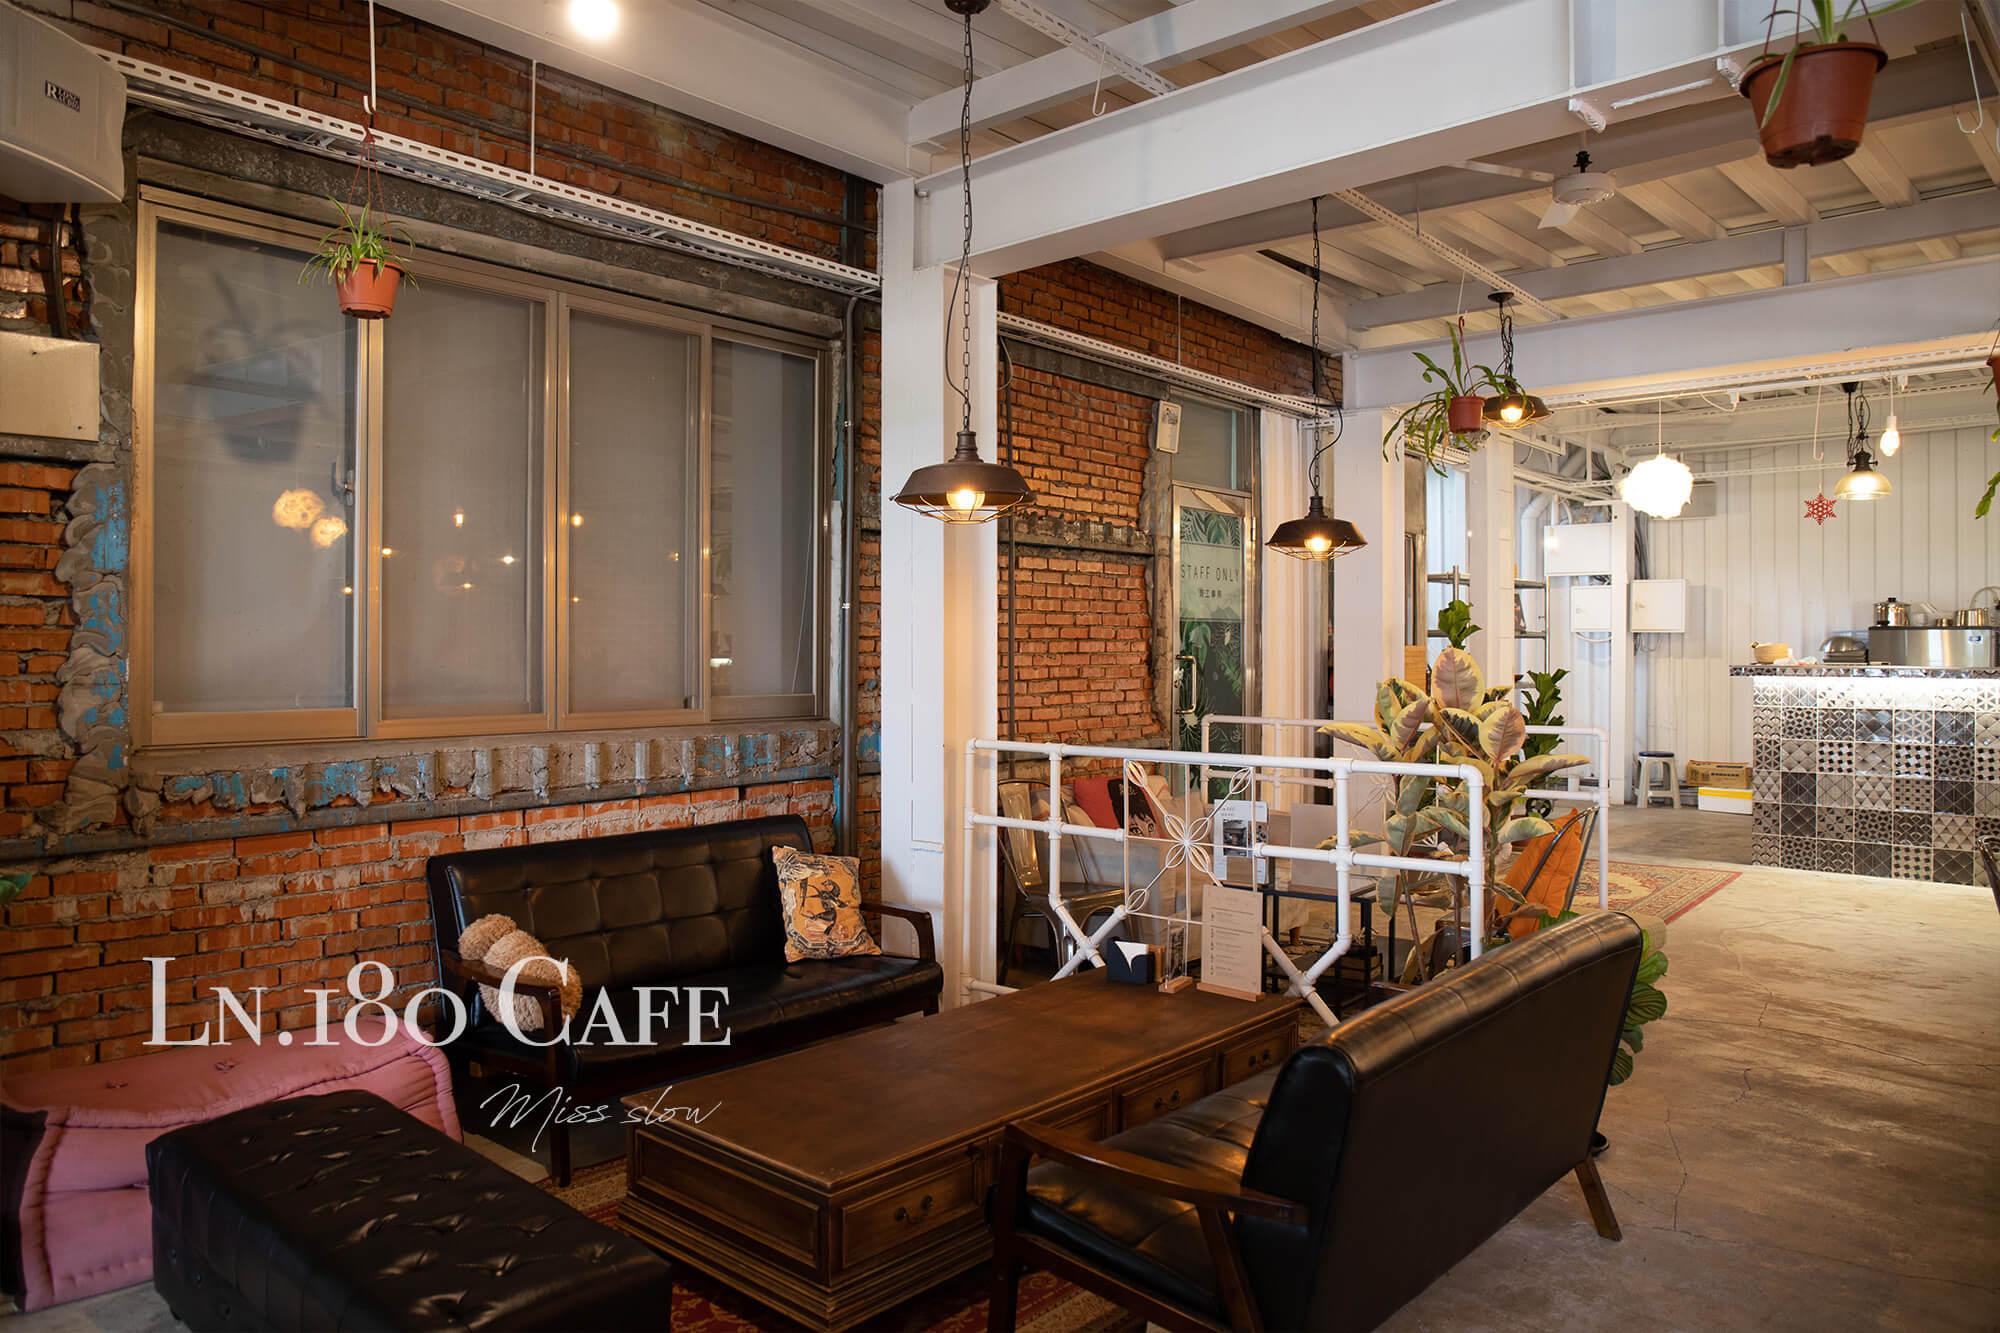 Ln180 Cafe_內部環境